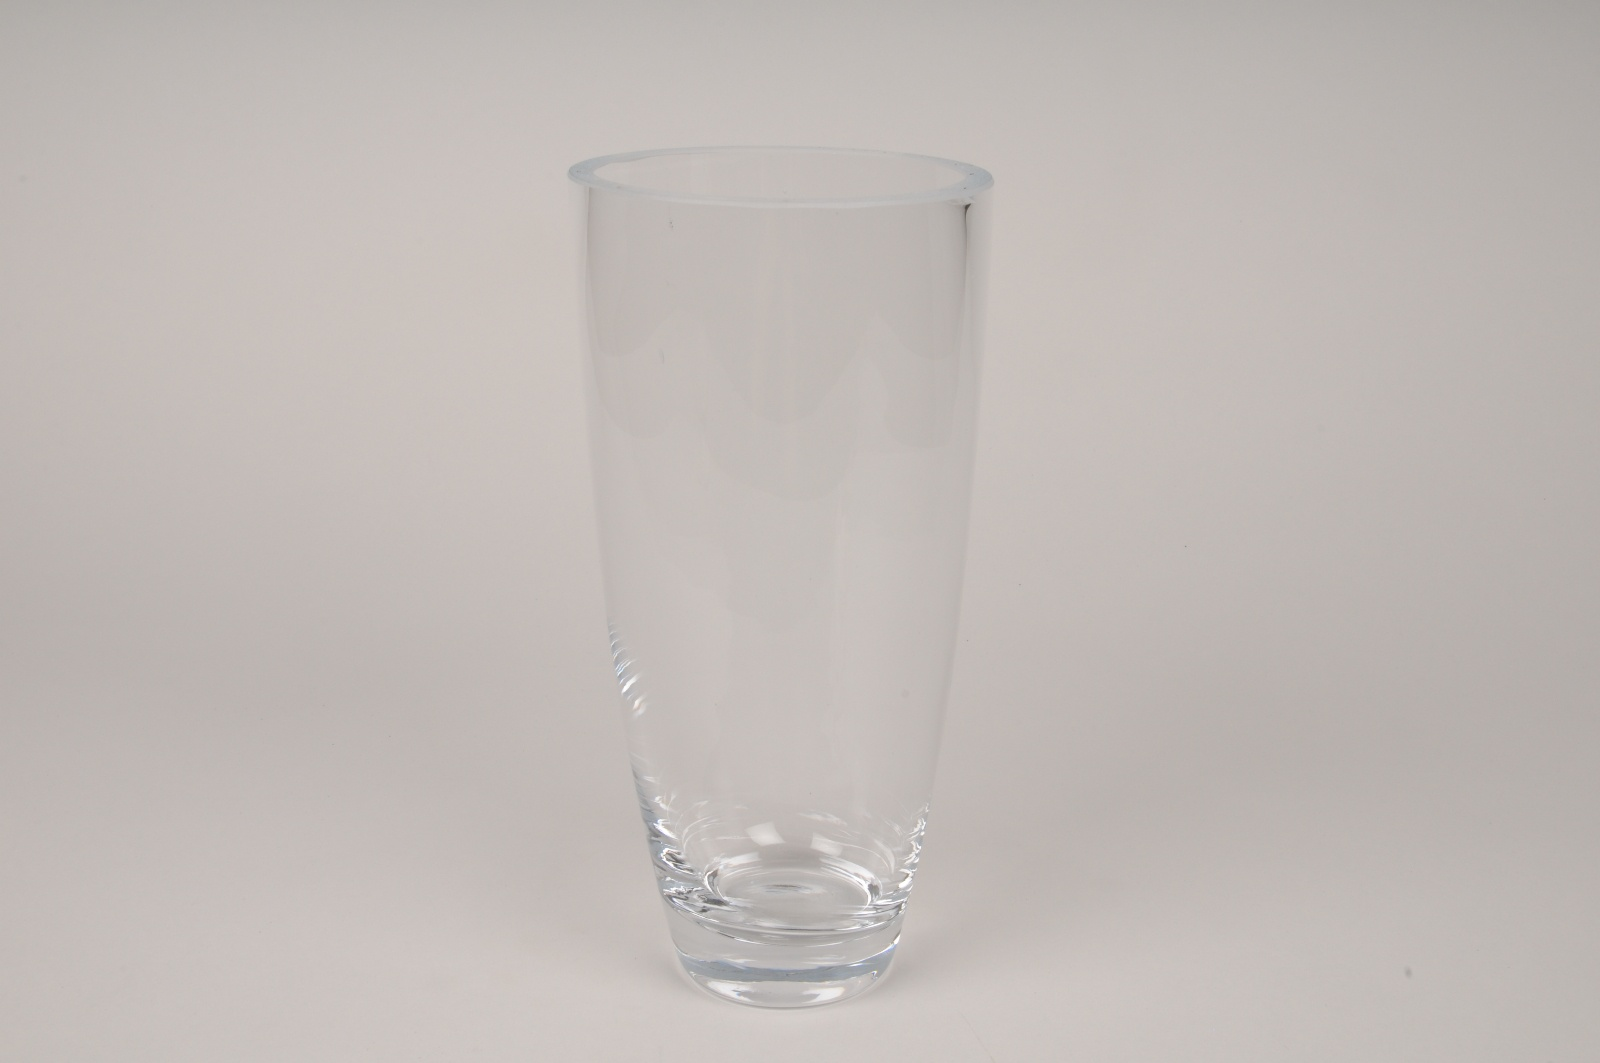 A034I0 Vase en verre obus D11.5cm H23.5cm